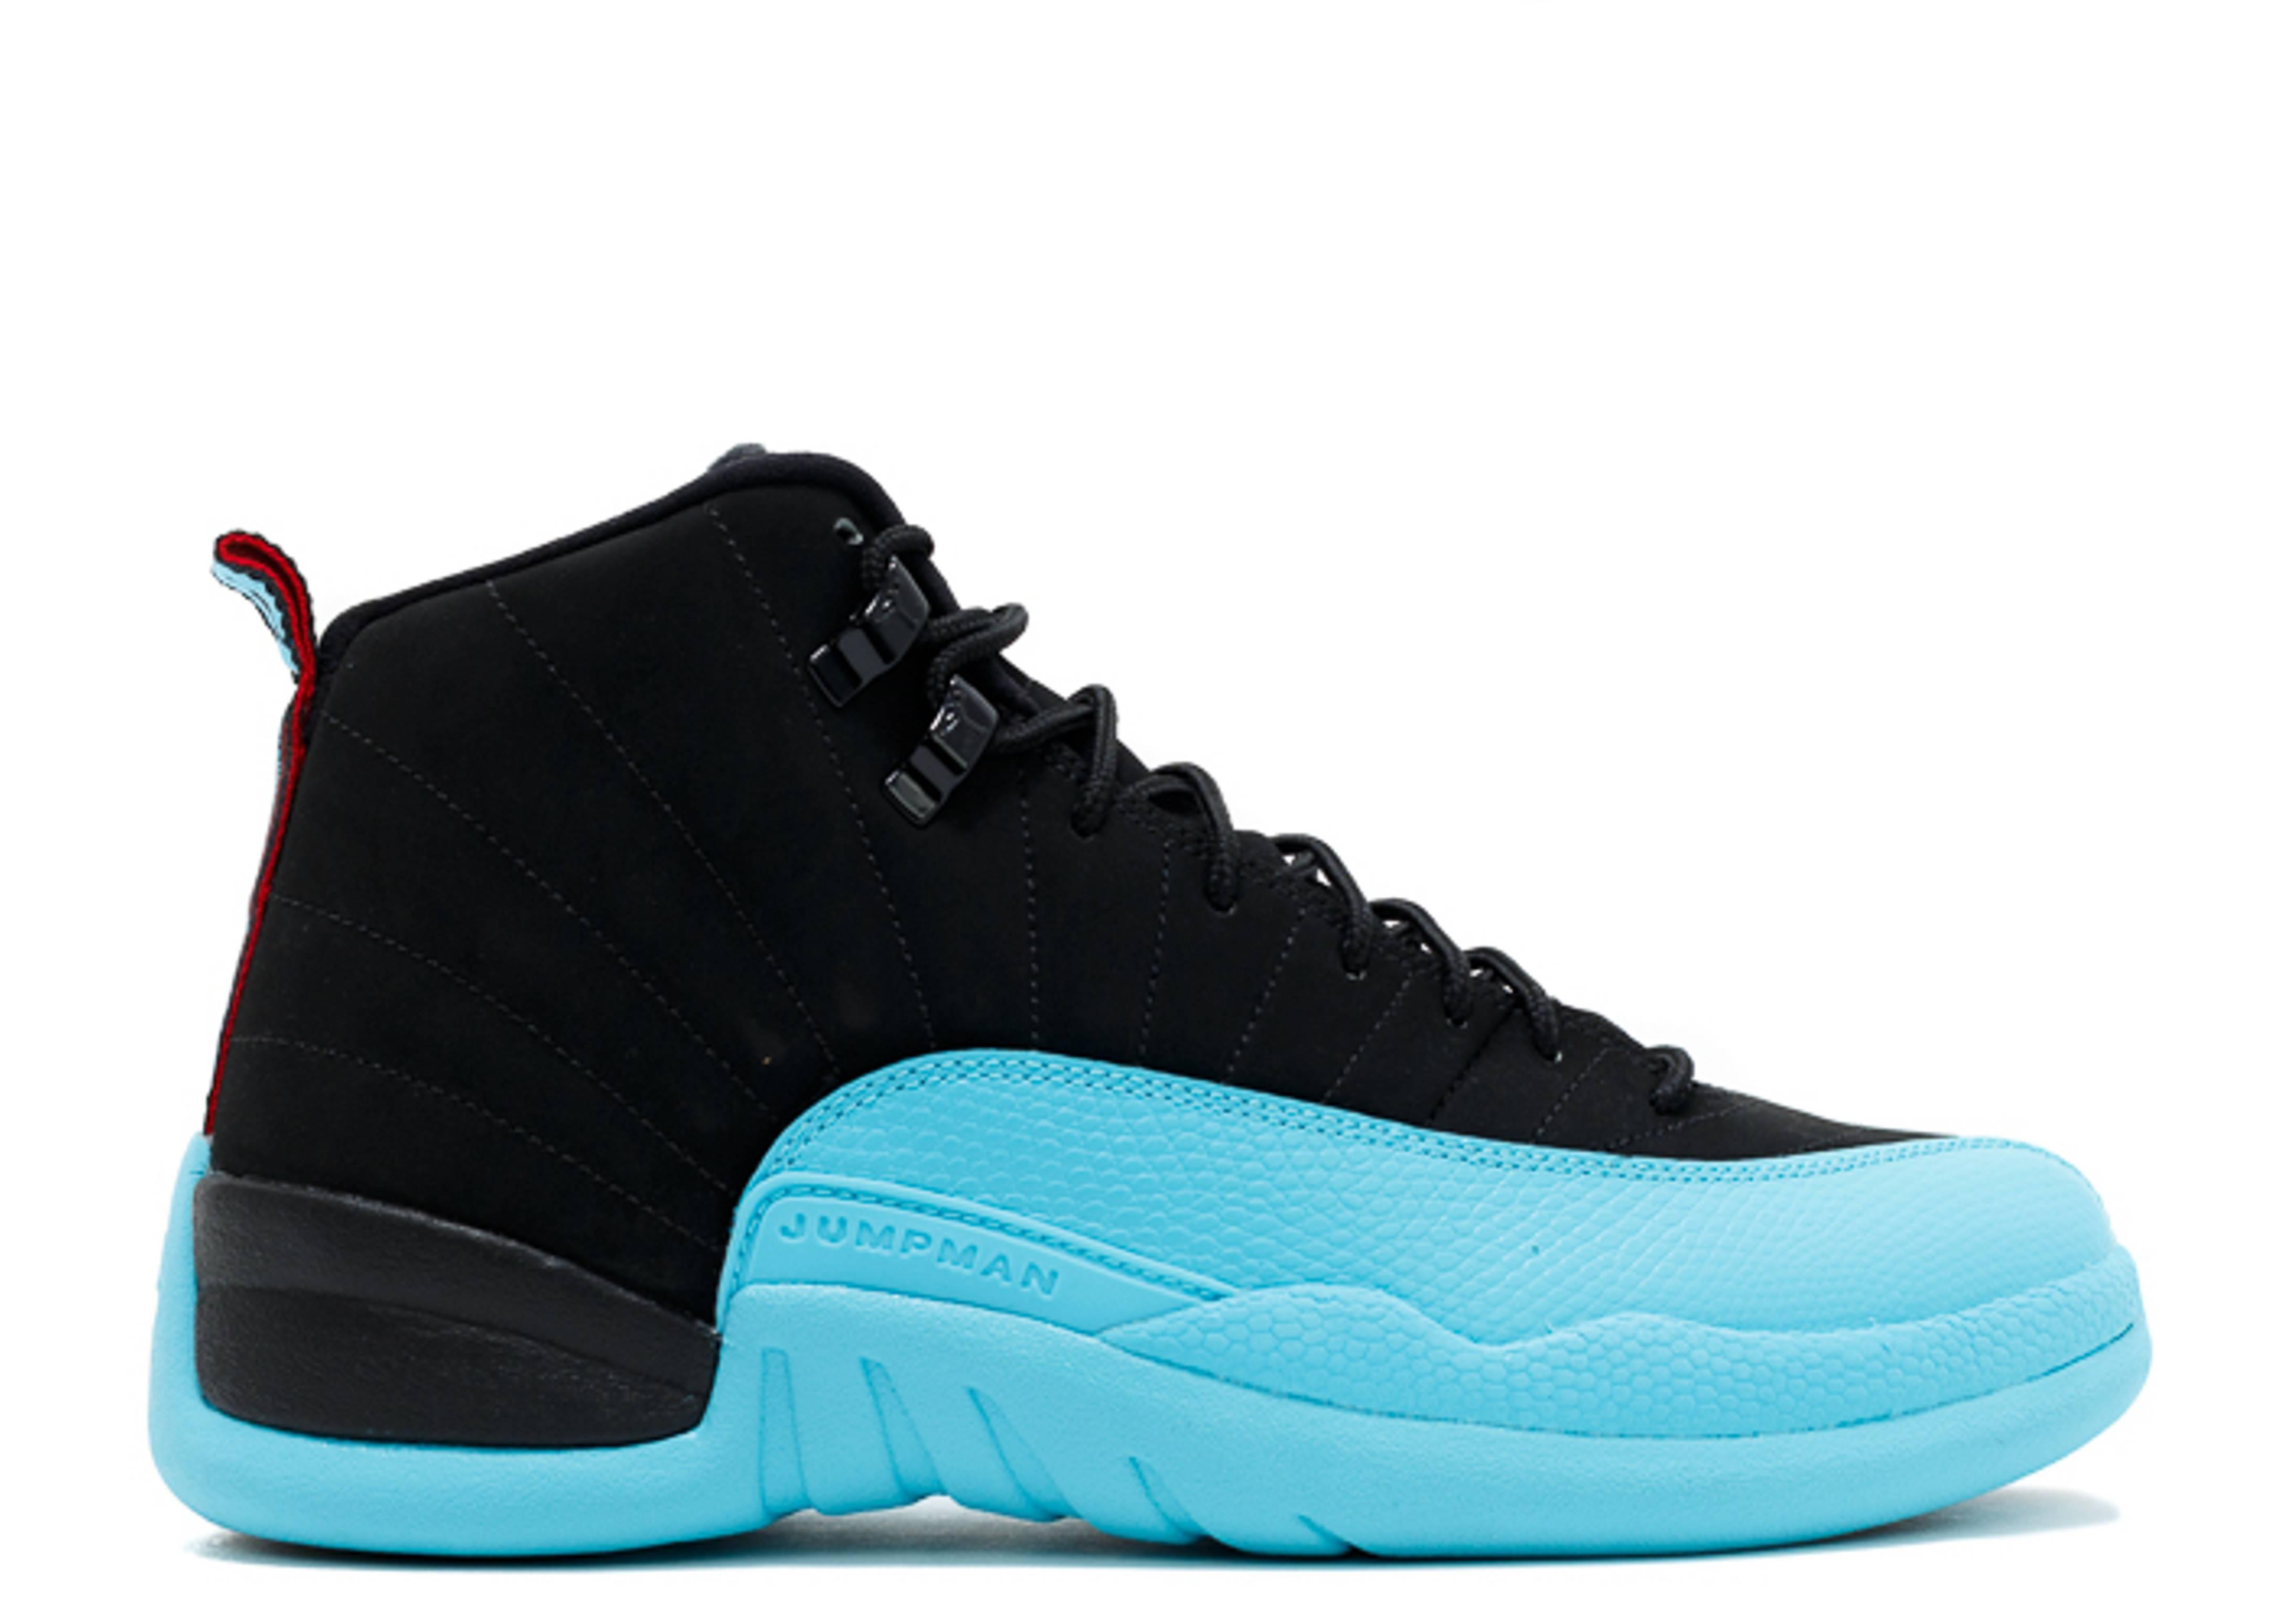 jordan 12 black and blue